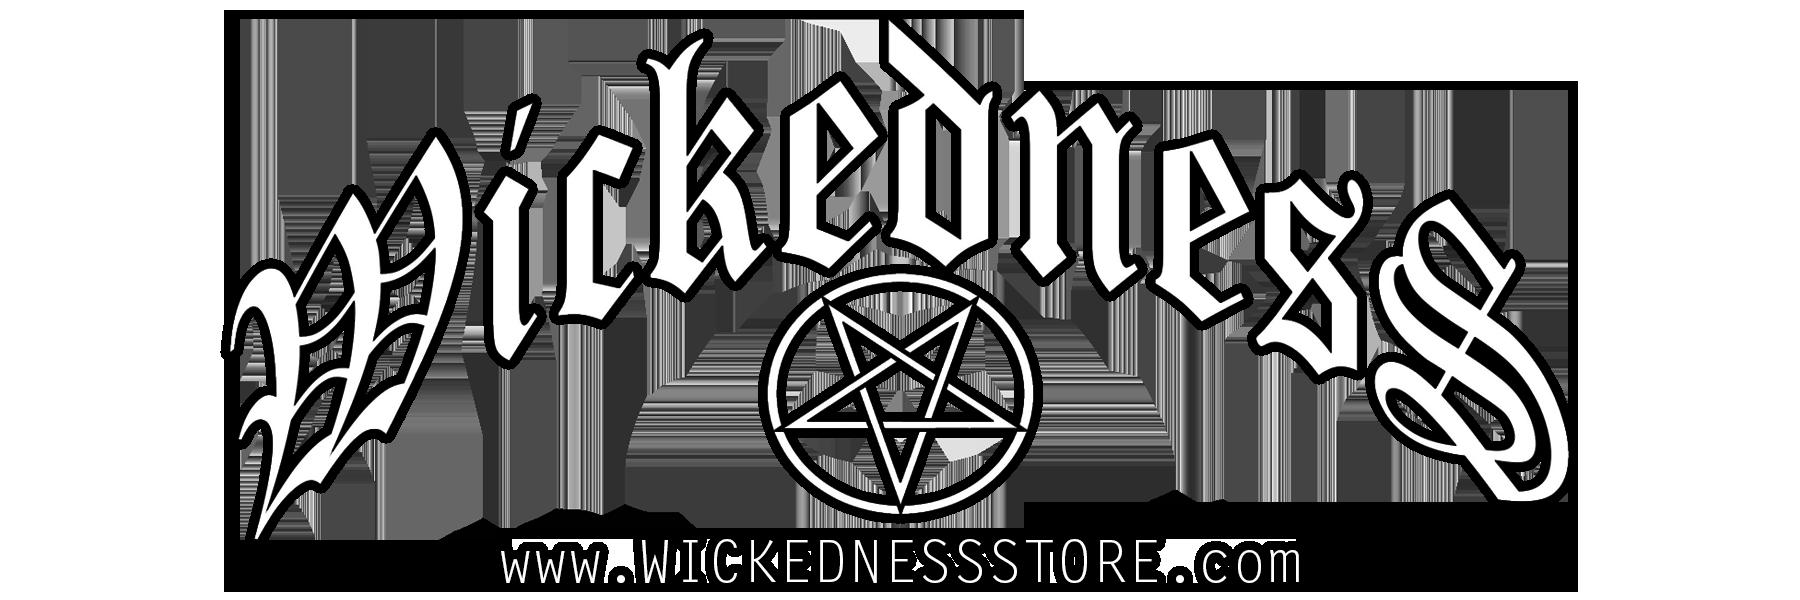 WickednessStore.com